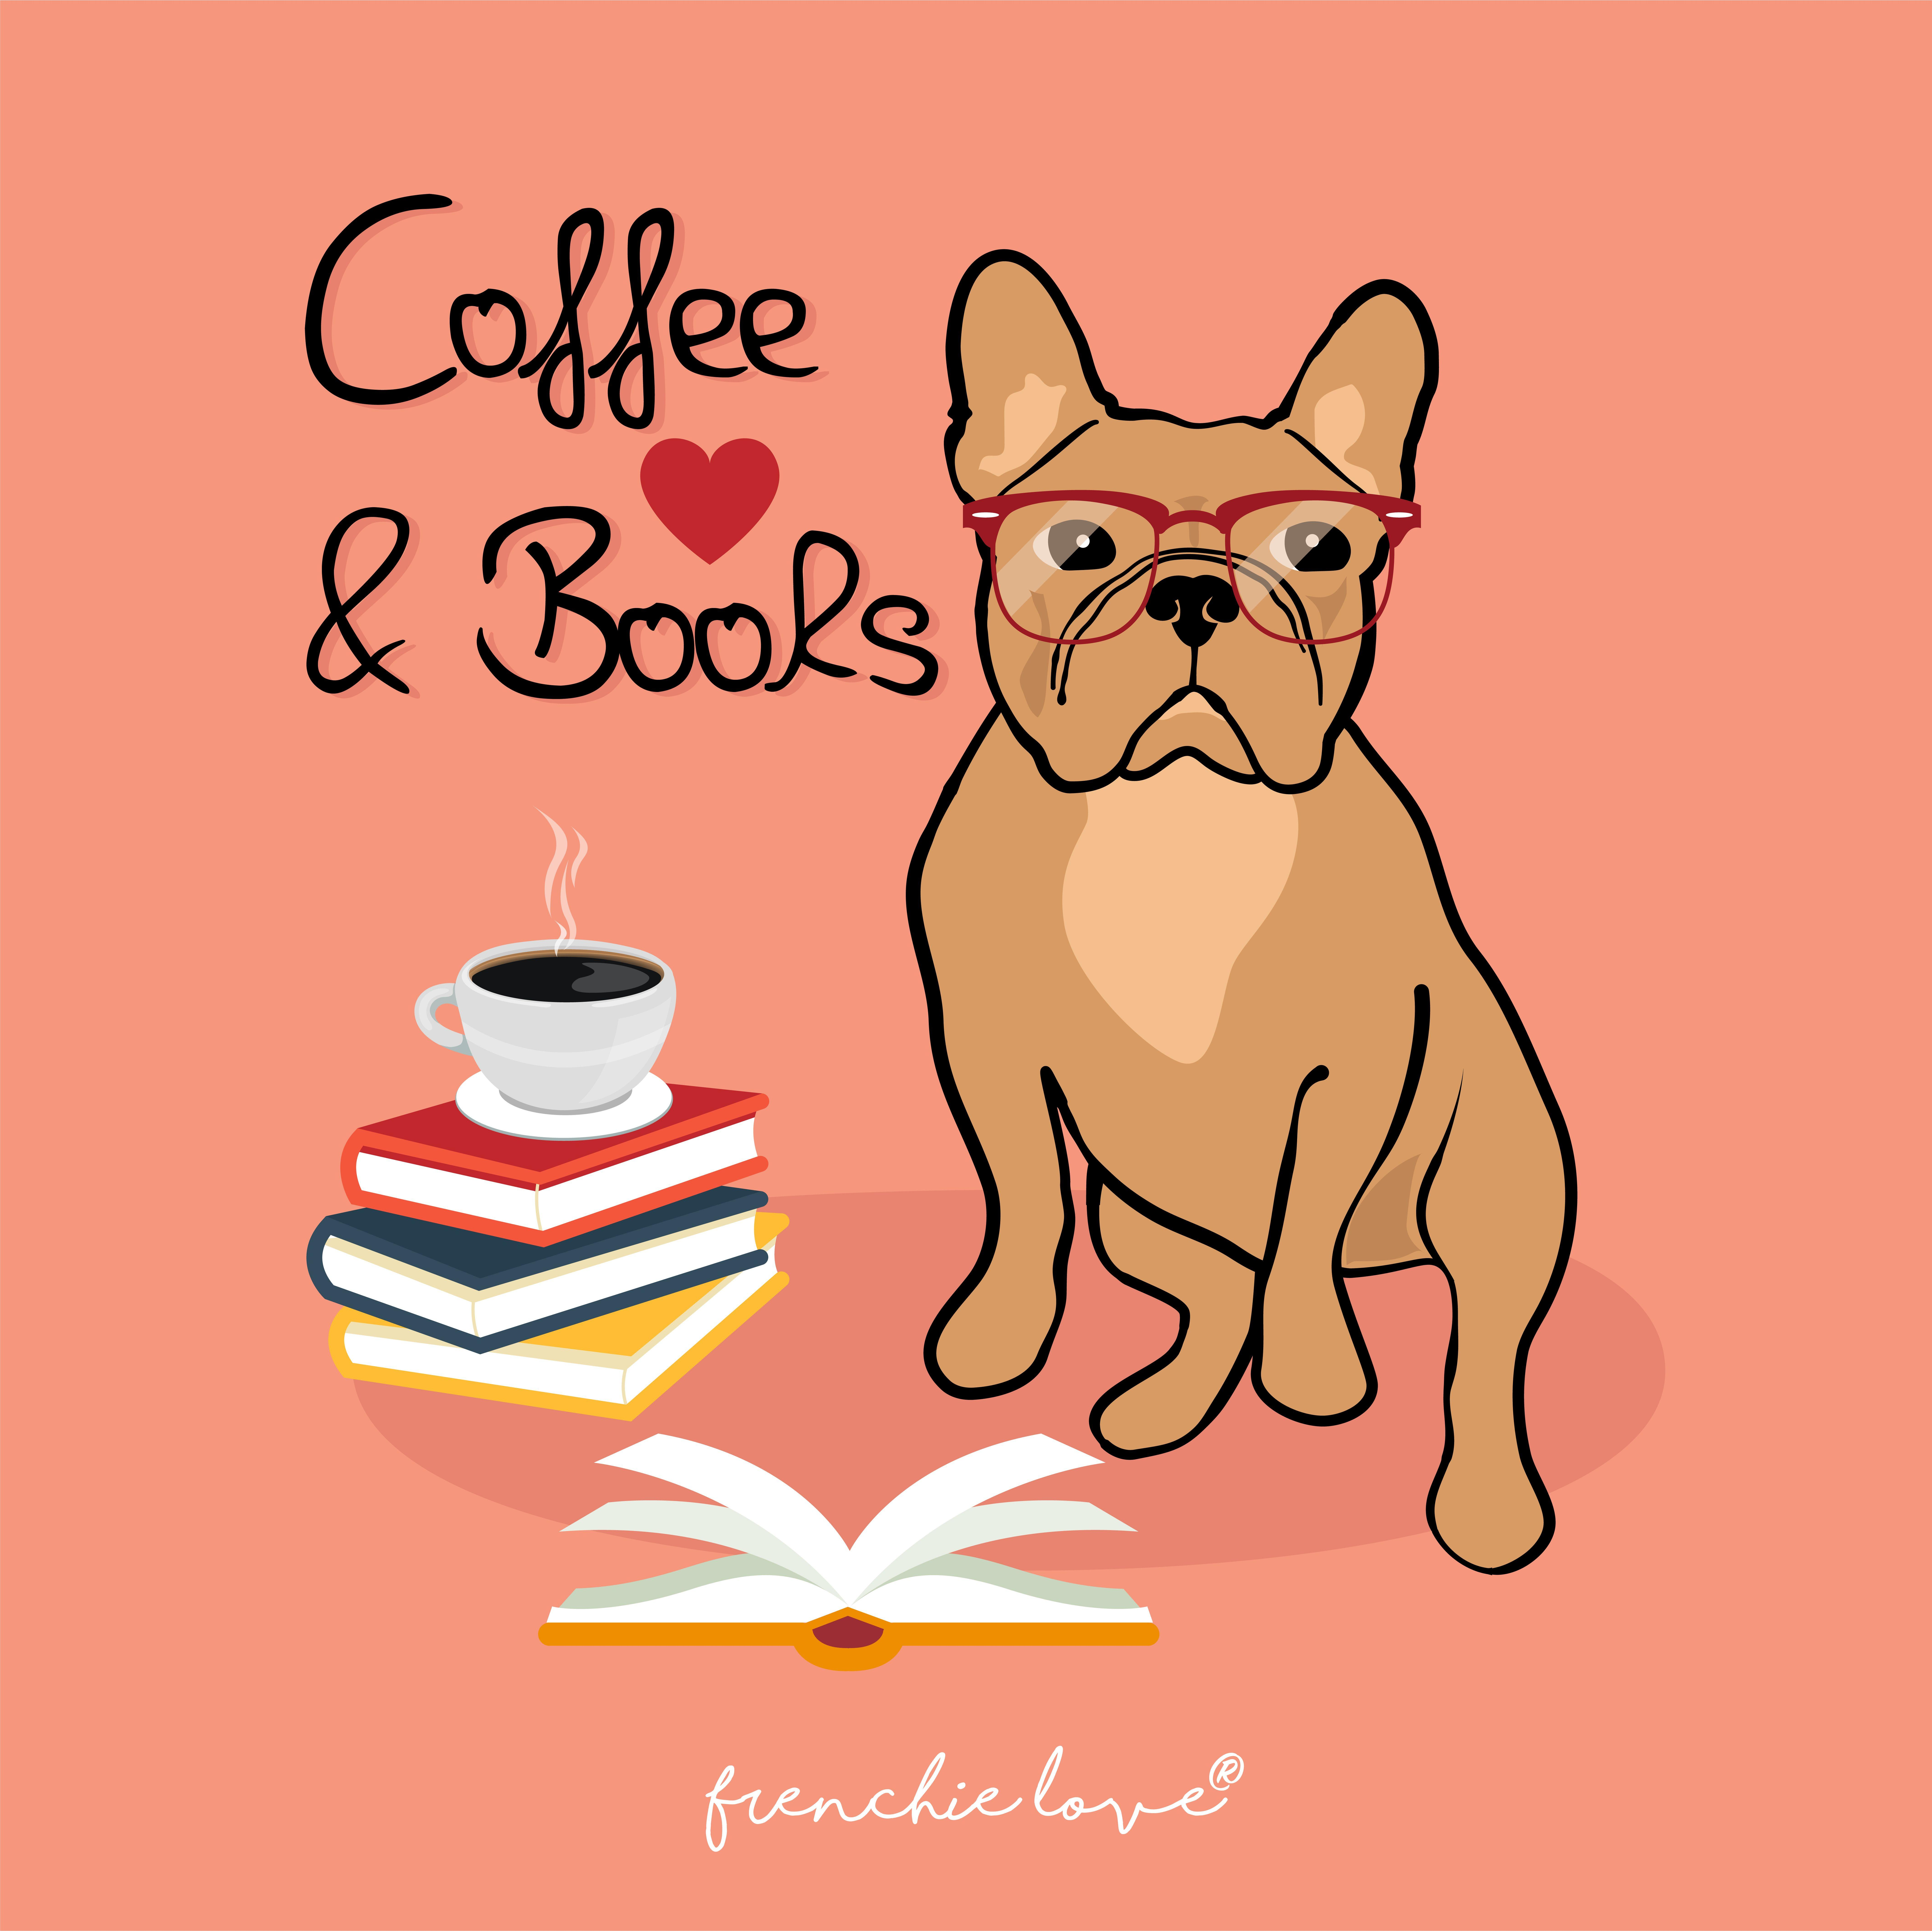 Home French bulldog gifts, Coffee, books, French bulldog